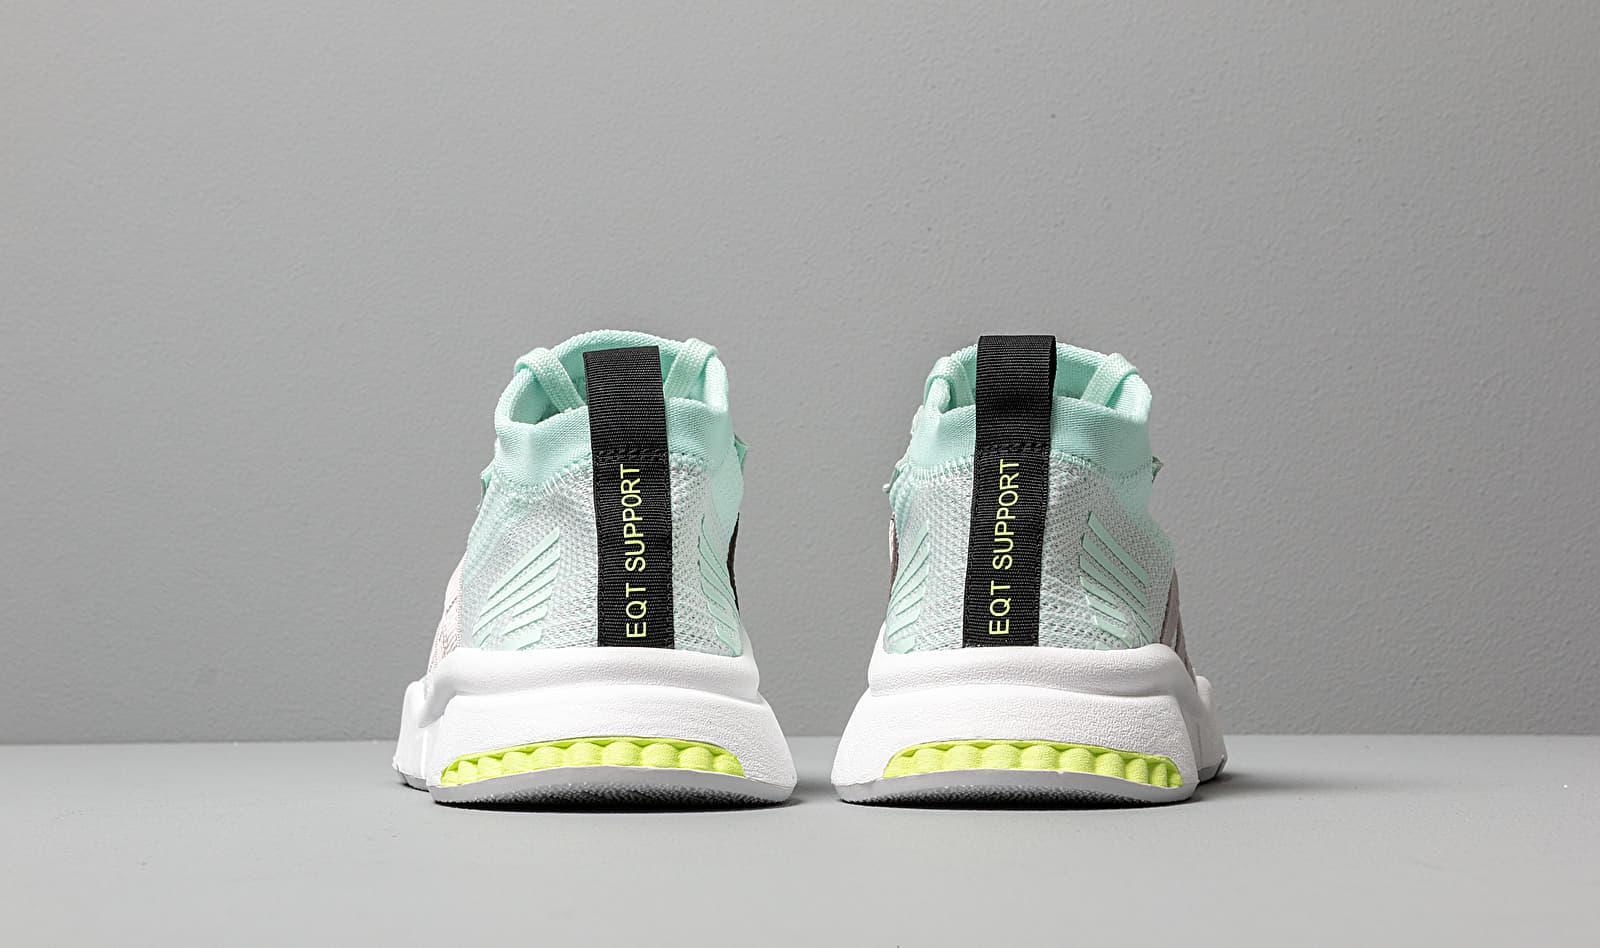 Adidas Eqt Support Mid Adv Primeknit Ice Mint/ Grey Two/ Core Black